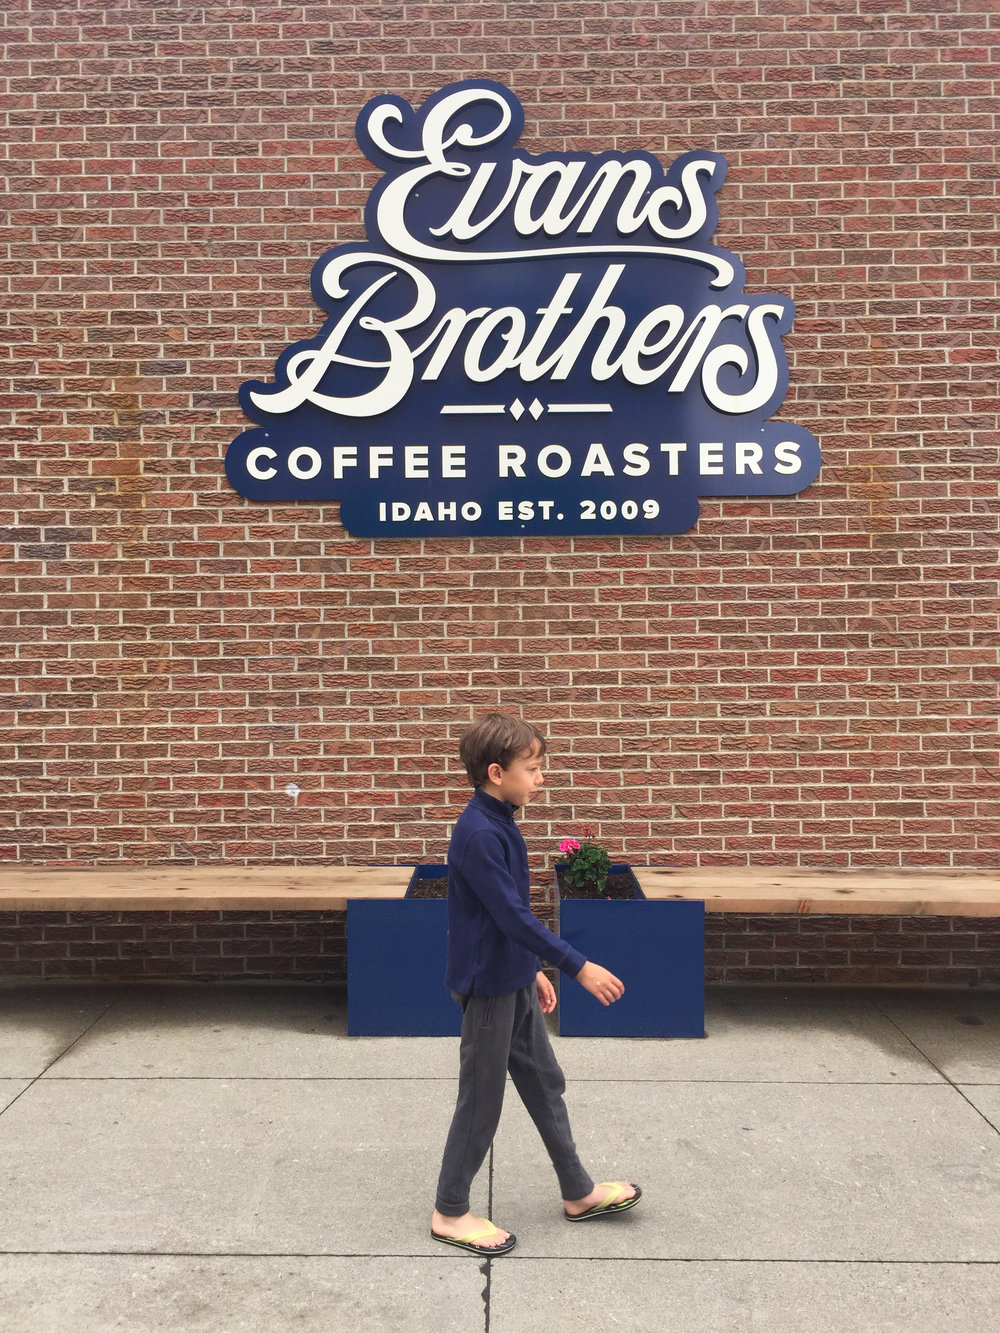 EVANS BROTHERS - IDAHO